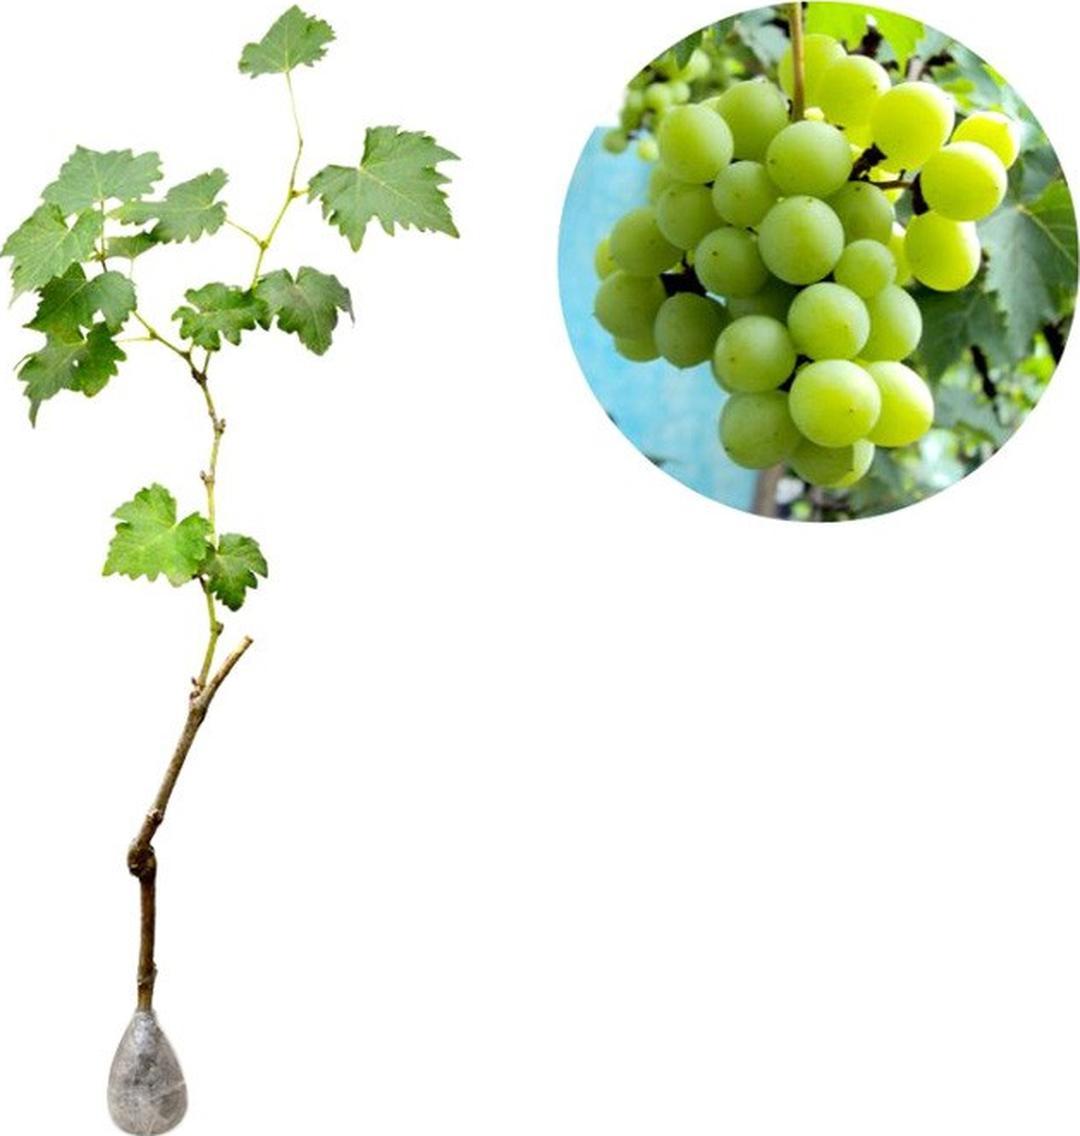 Istimewa! Bibit Buah Anggur Hijau Green Belgium Kota Kediri #bibit buah genjah